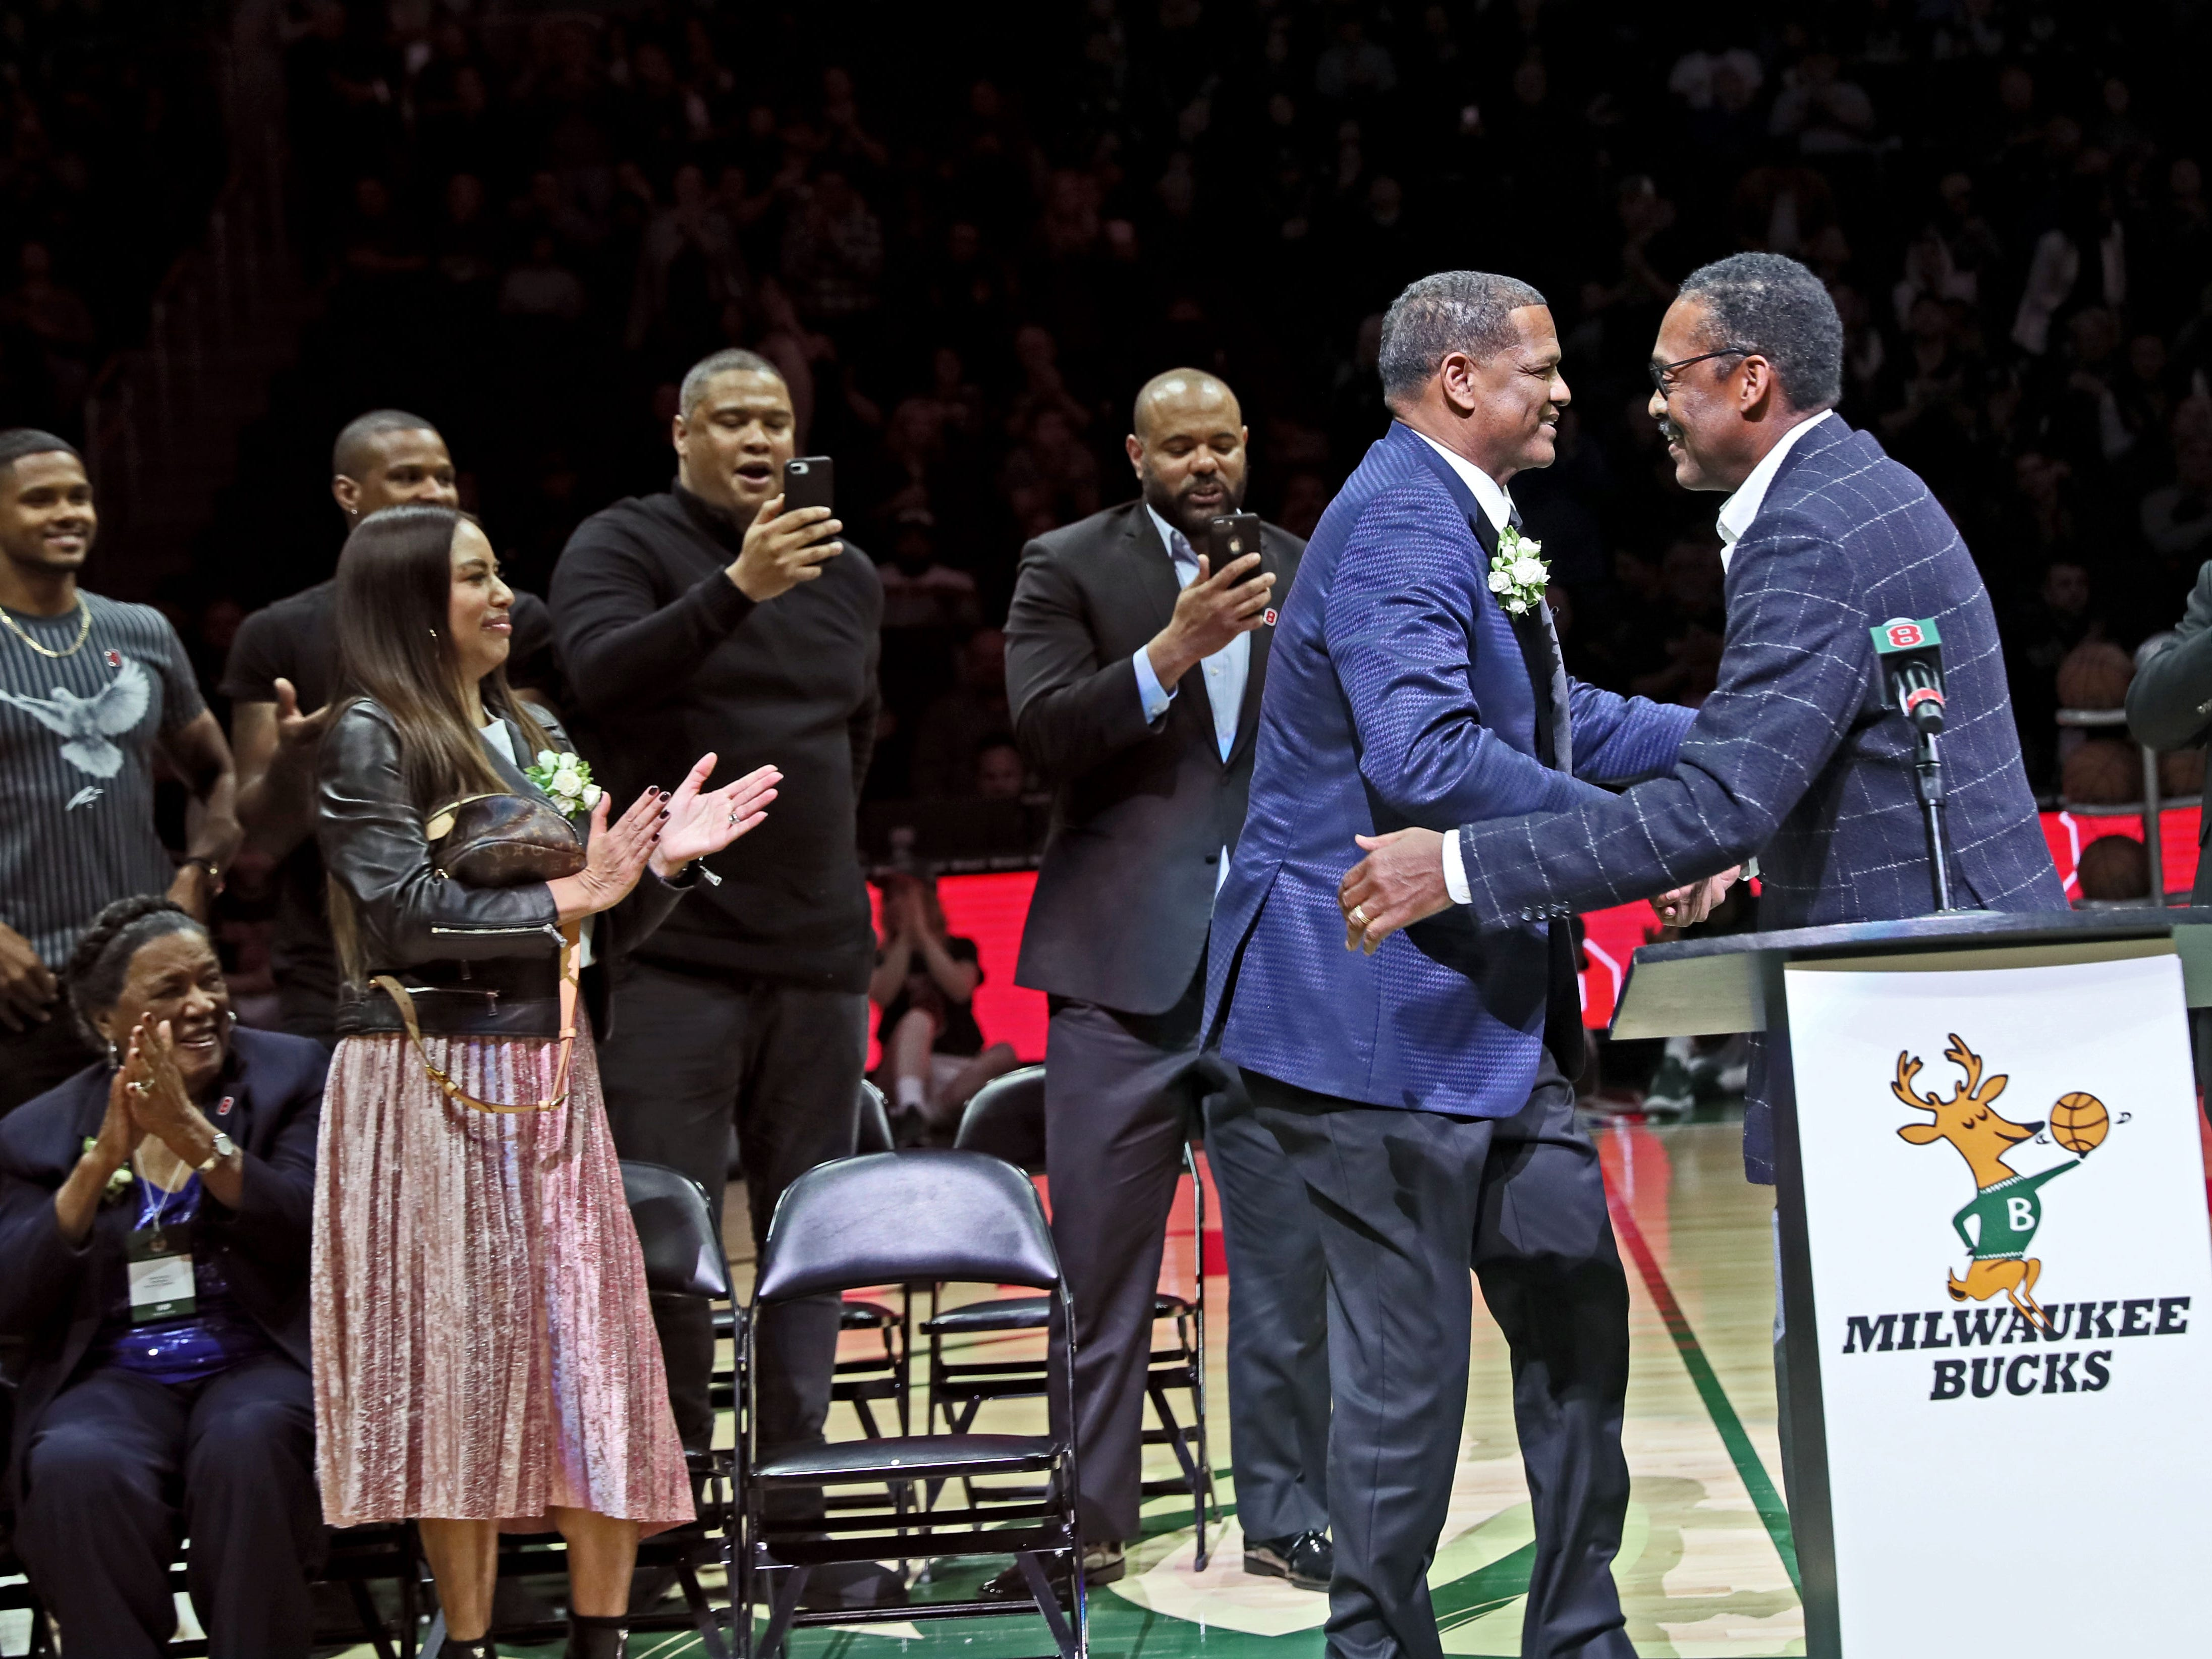 Junior Bridgeman (right) congratulates Marcus Johnson during a halftime ceremony in which the Bucks retired Johnson's No. 8 jersey.